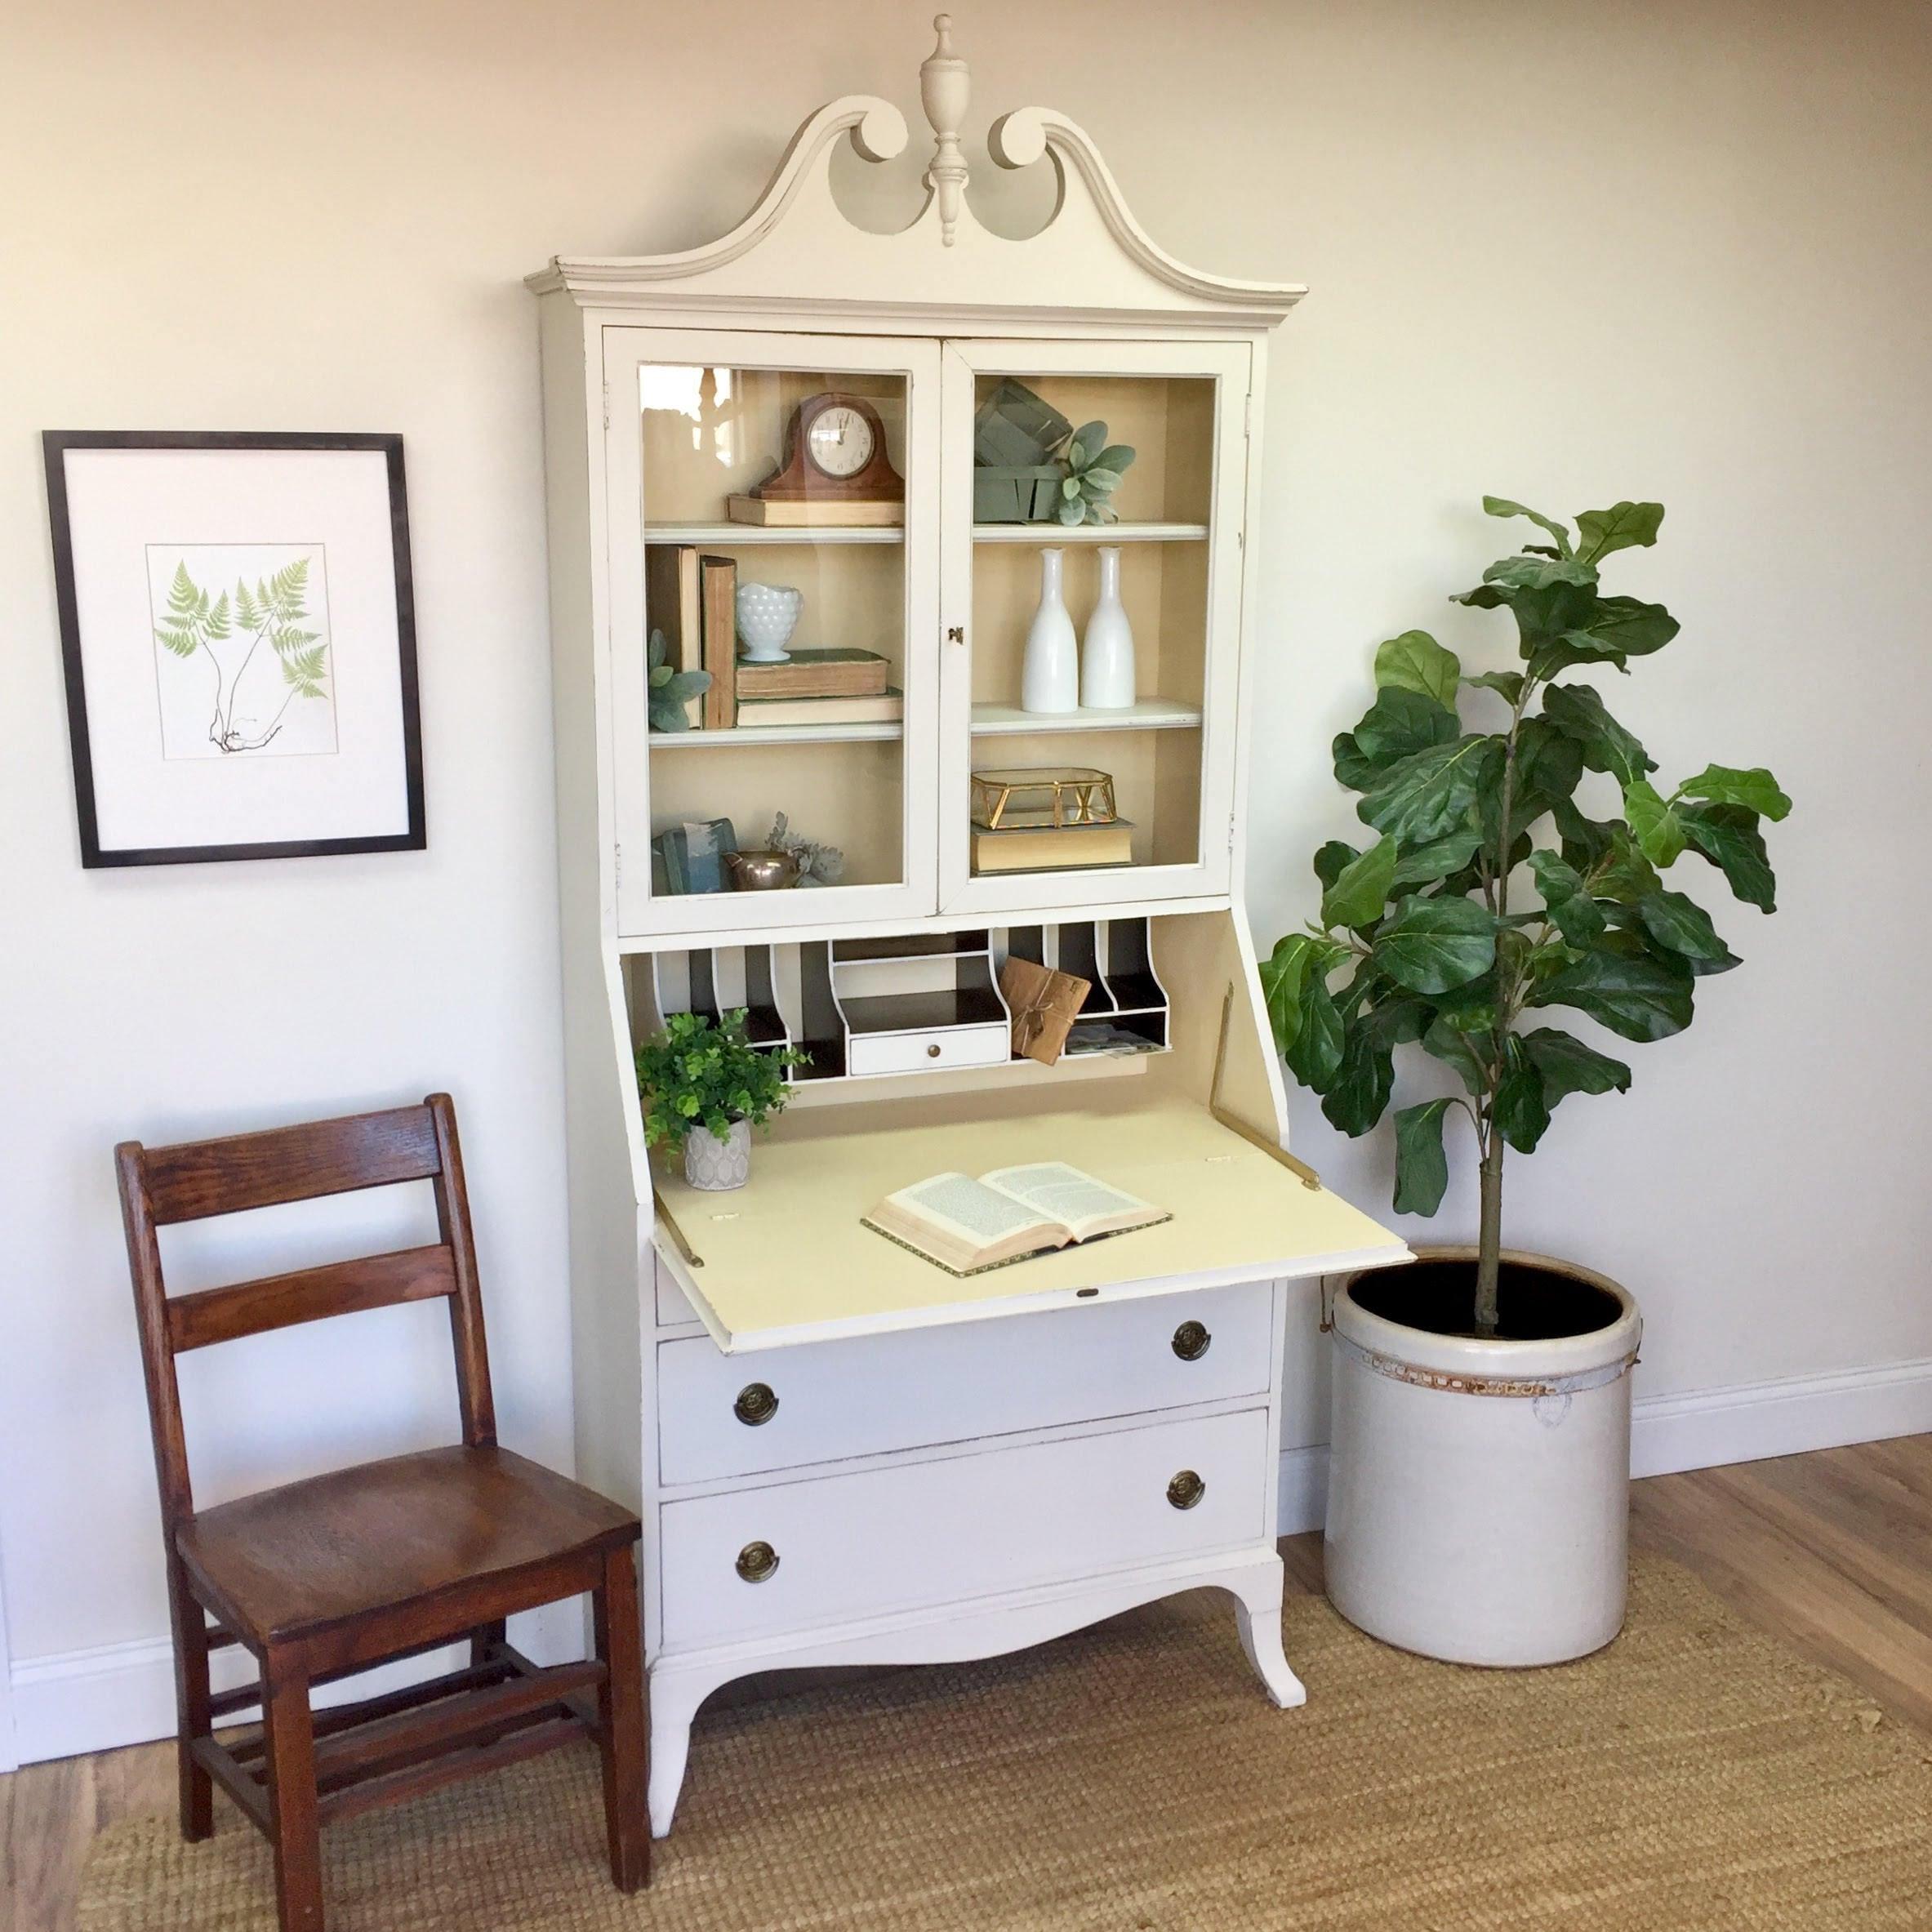 Antique Secretary Desk With Hutch   Home Office Furniture   Compact Desk   Tall  Secretary Desk   Drop Front Desk   Home Desk   Antique Desk